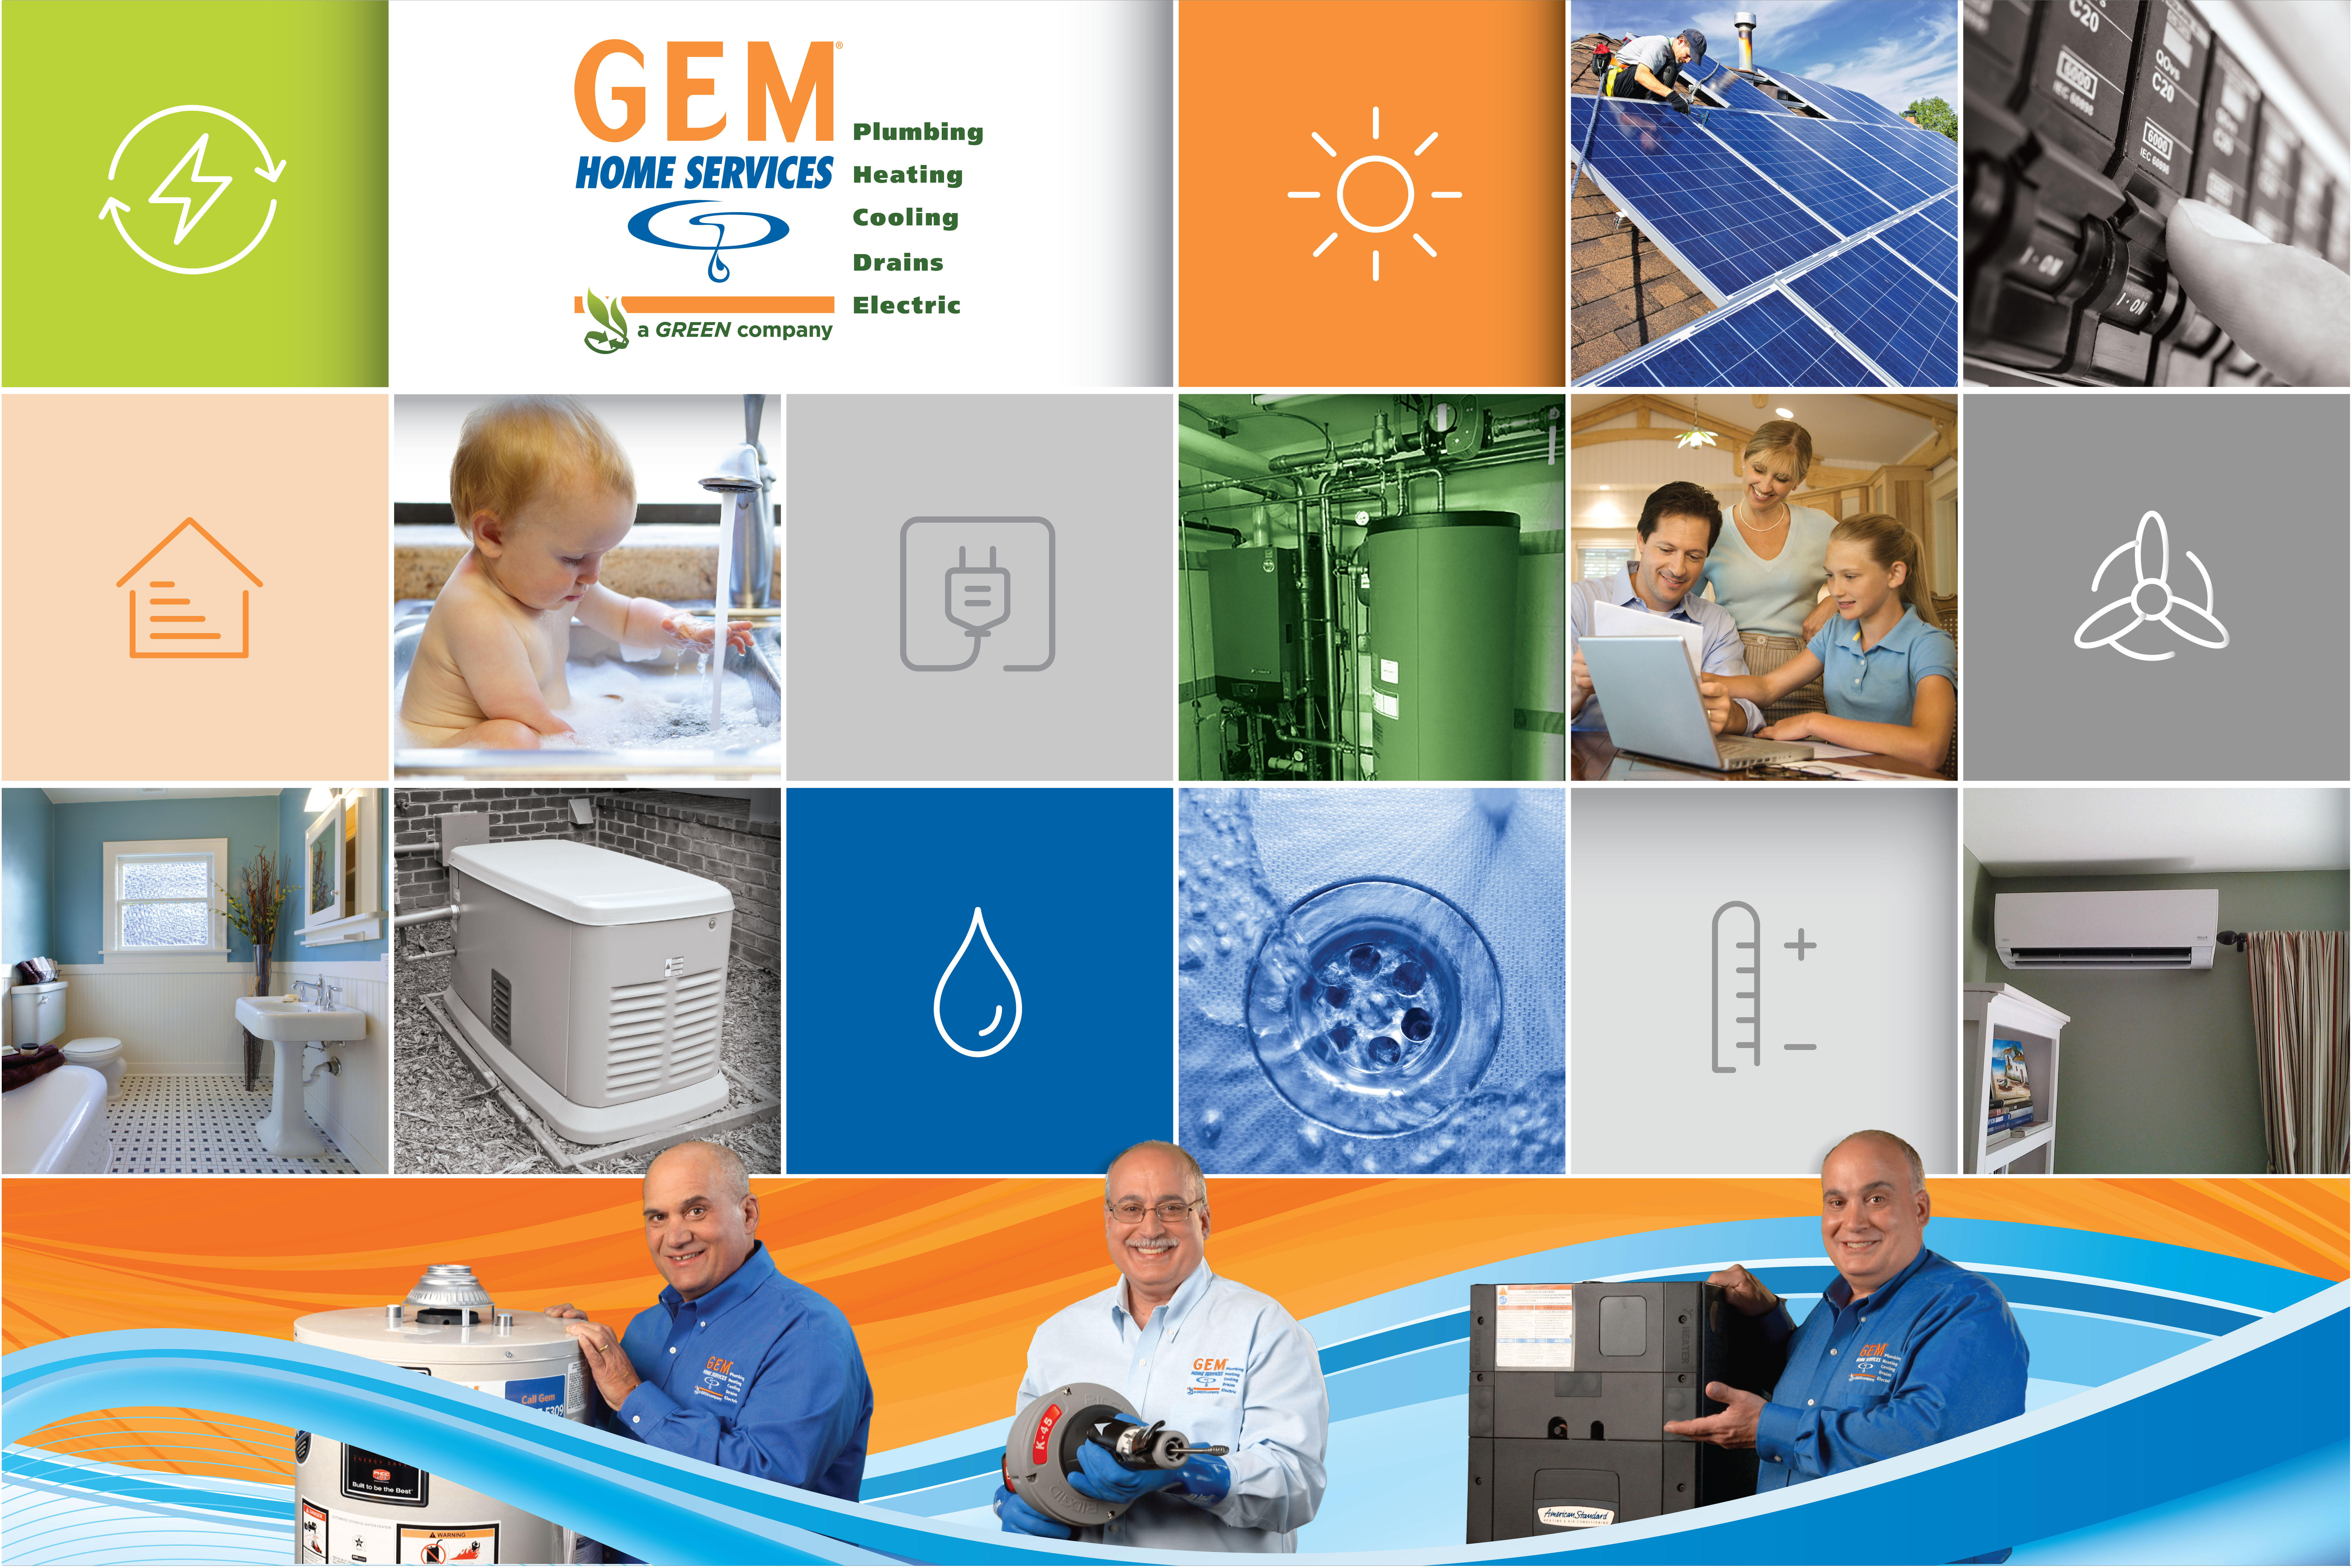 Gem Plumbing & Heating Services, Inc. image 2